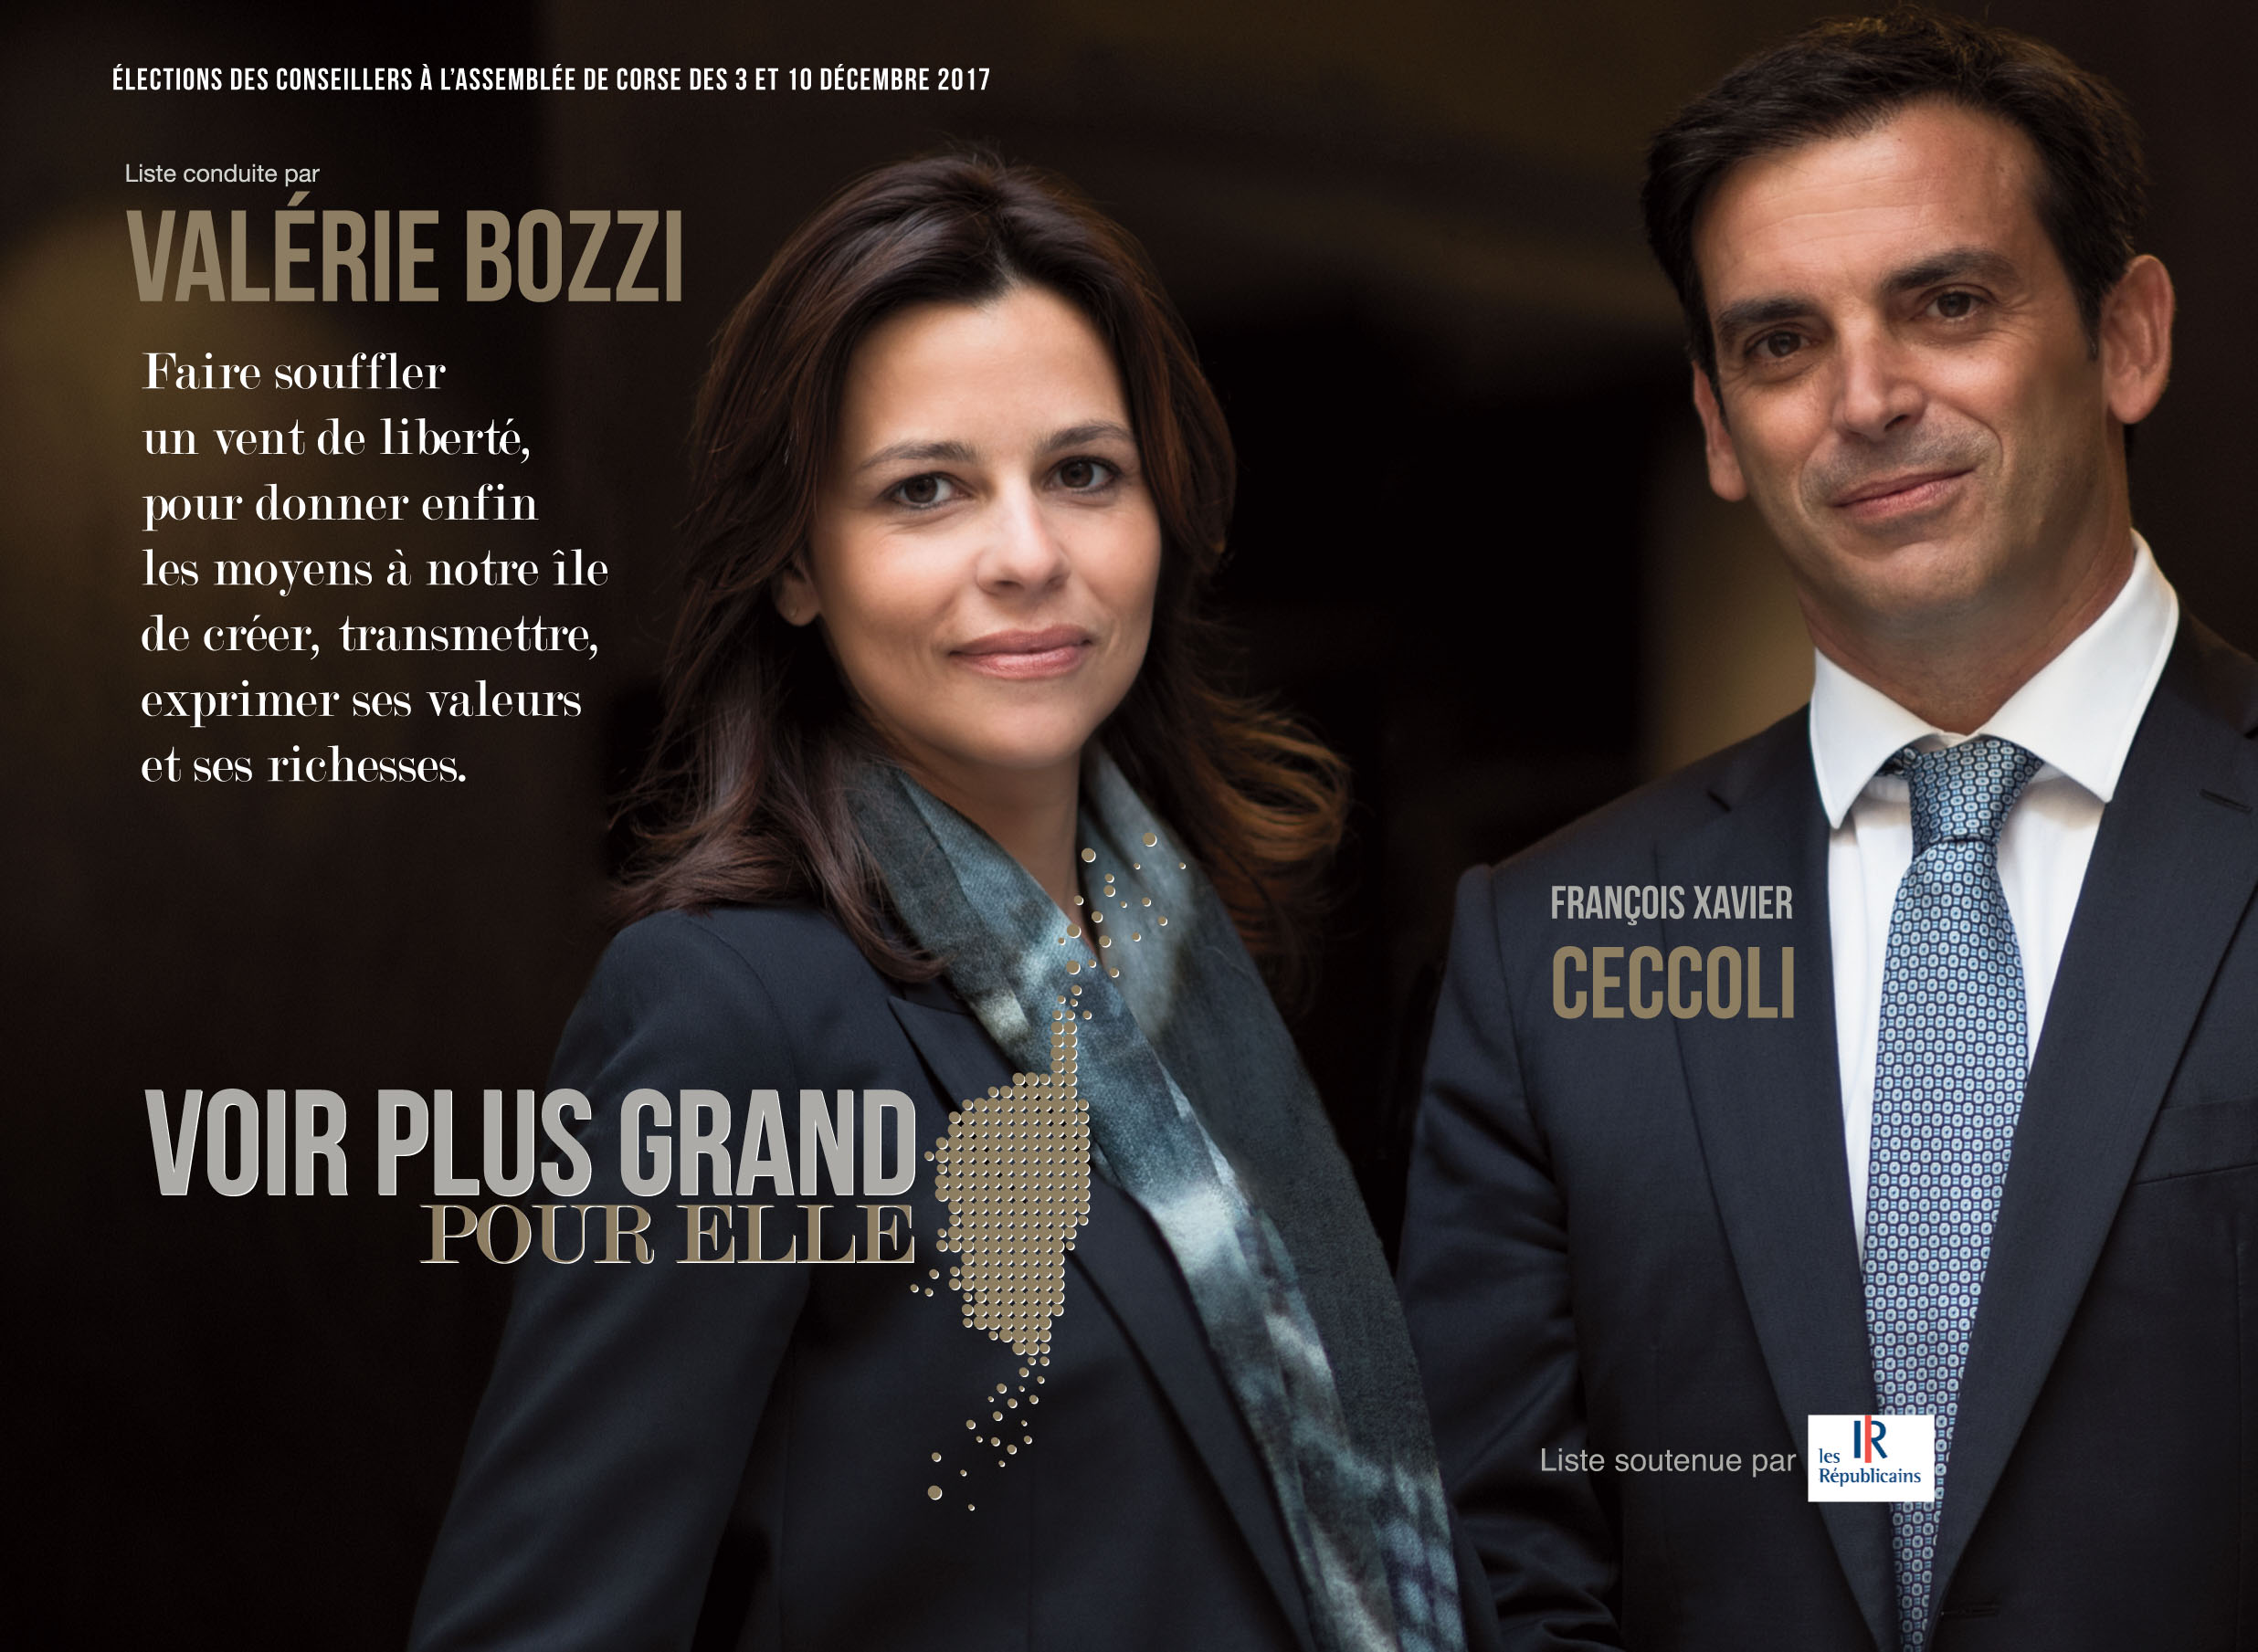 Valérie Bozzi en meeting à Ajaccio le jeudi 30 novembre.